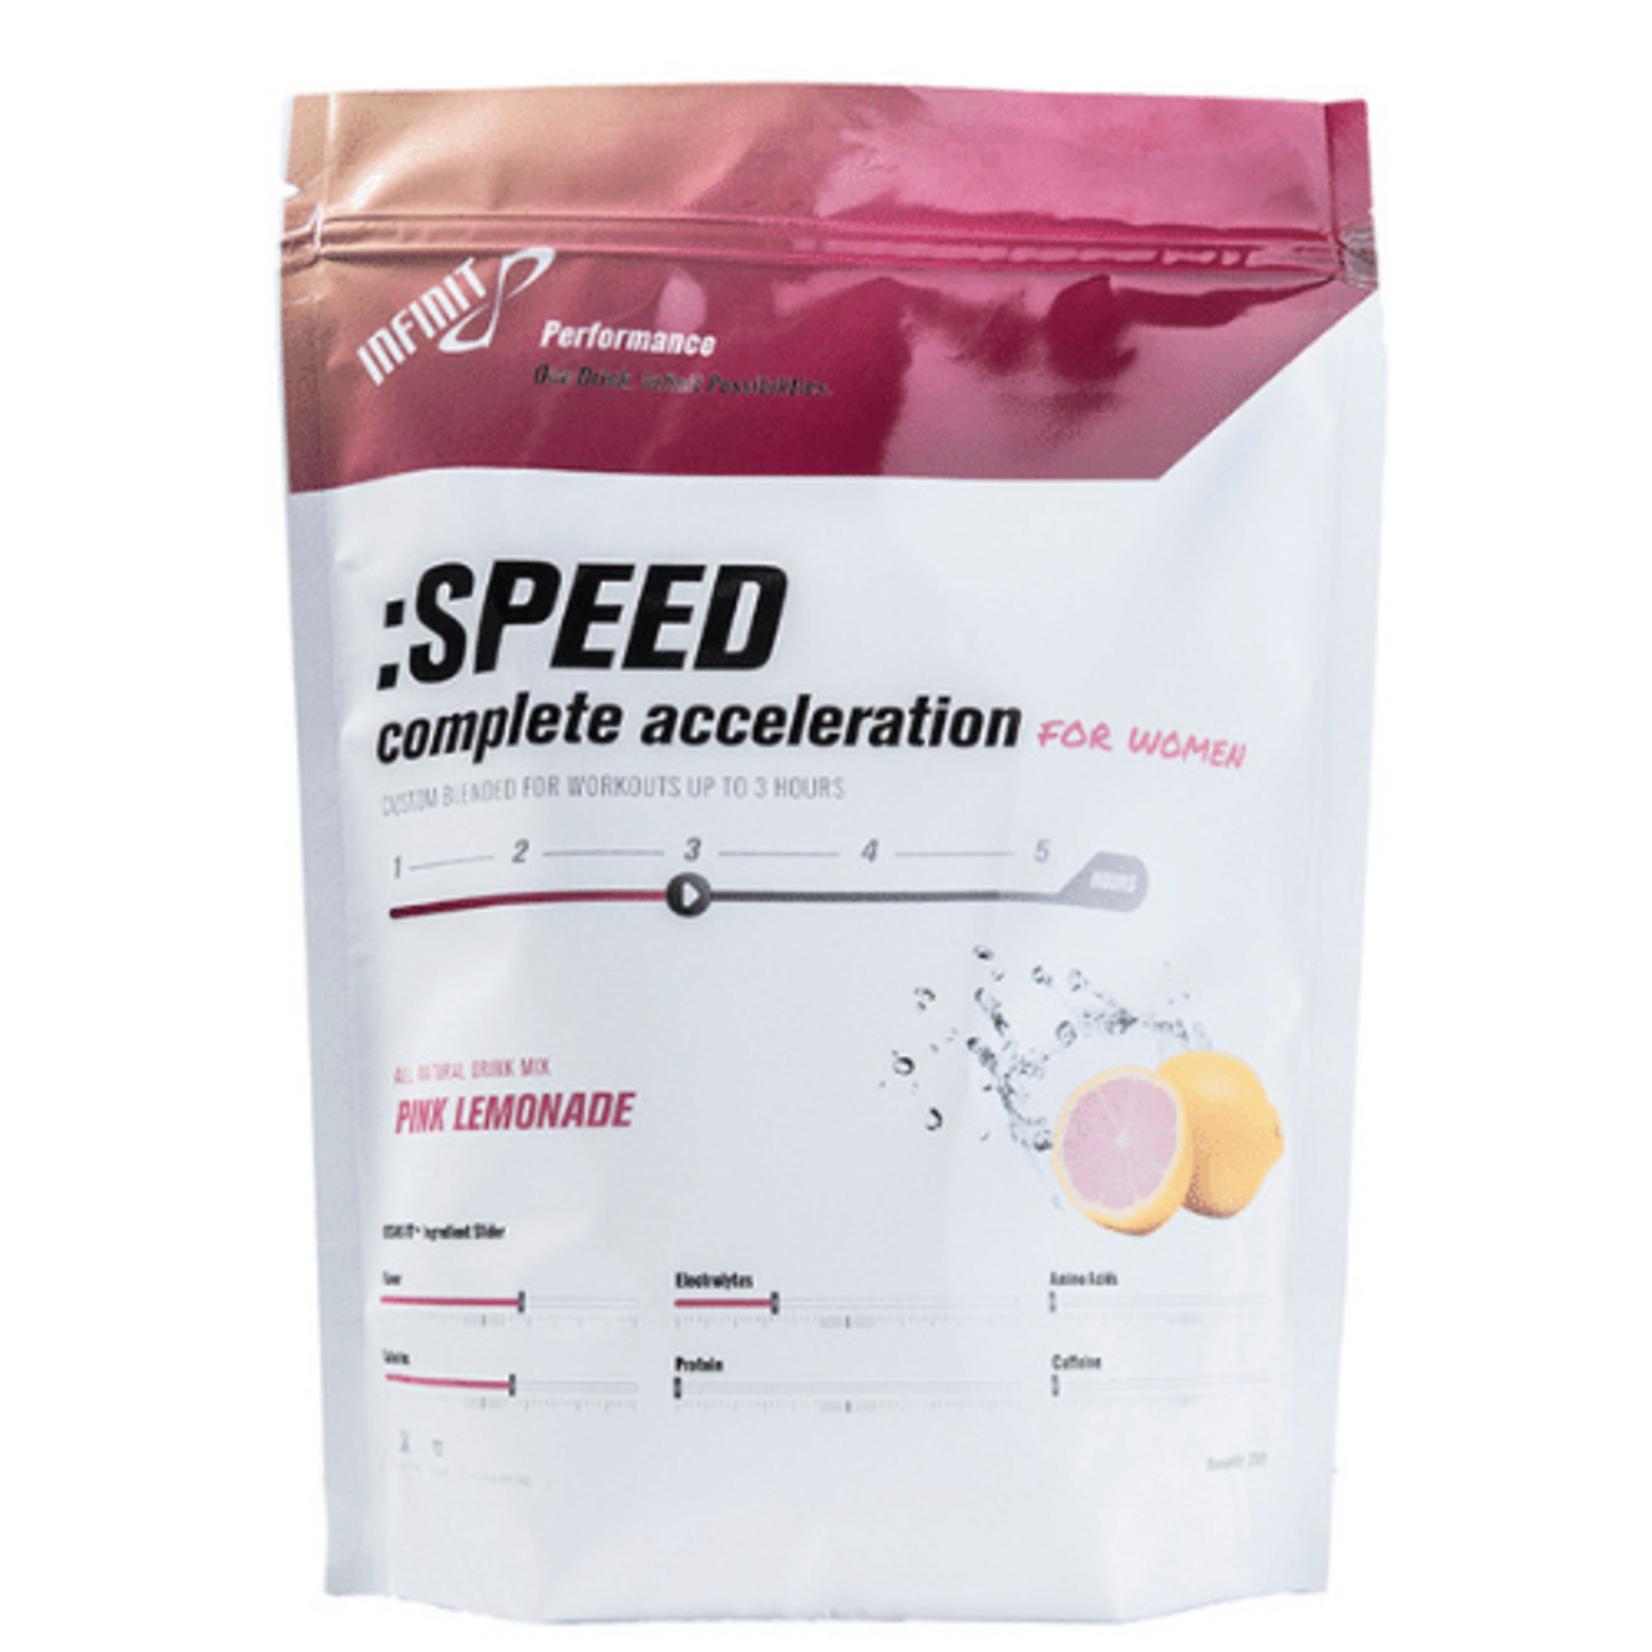 INFINIT NUTRITION LLC SPEED for women Pink Lemonade 22